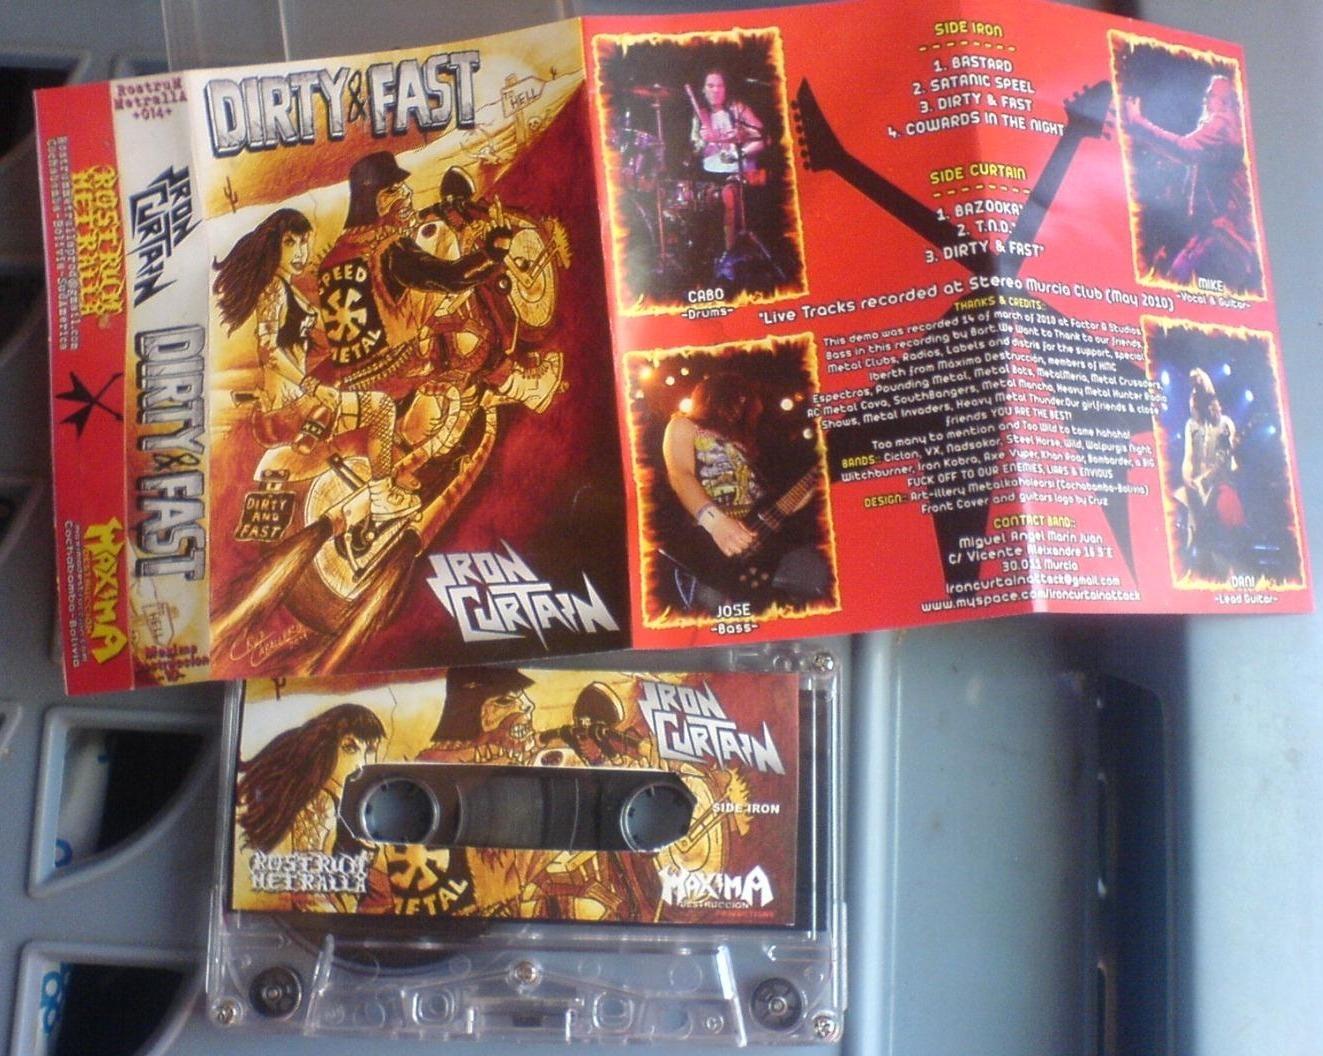 IRON CURTAIN reeditan su anterior demo en formato cassette.